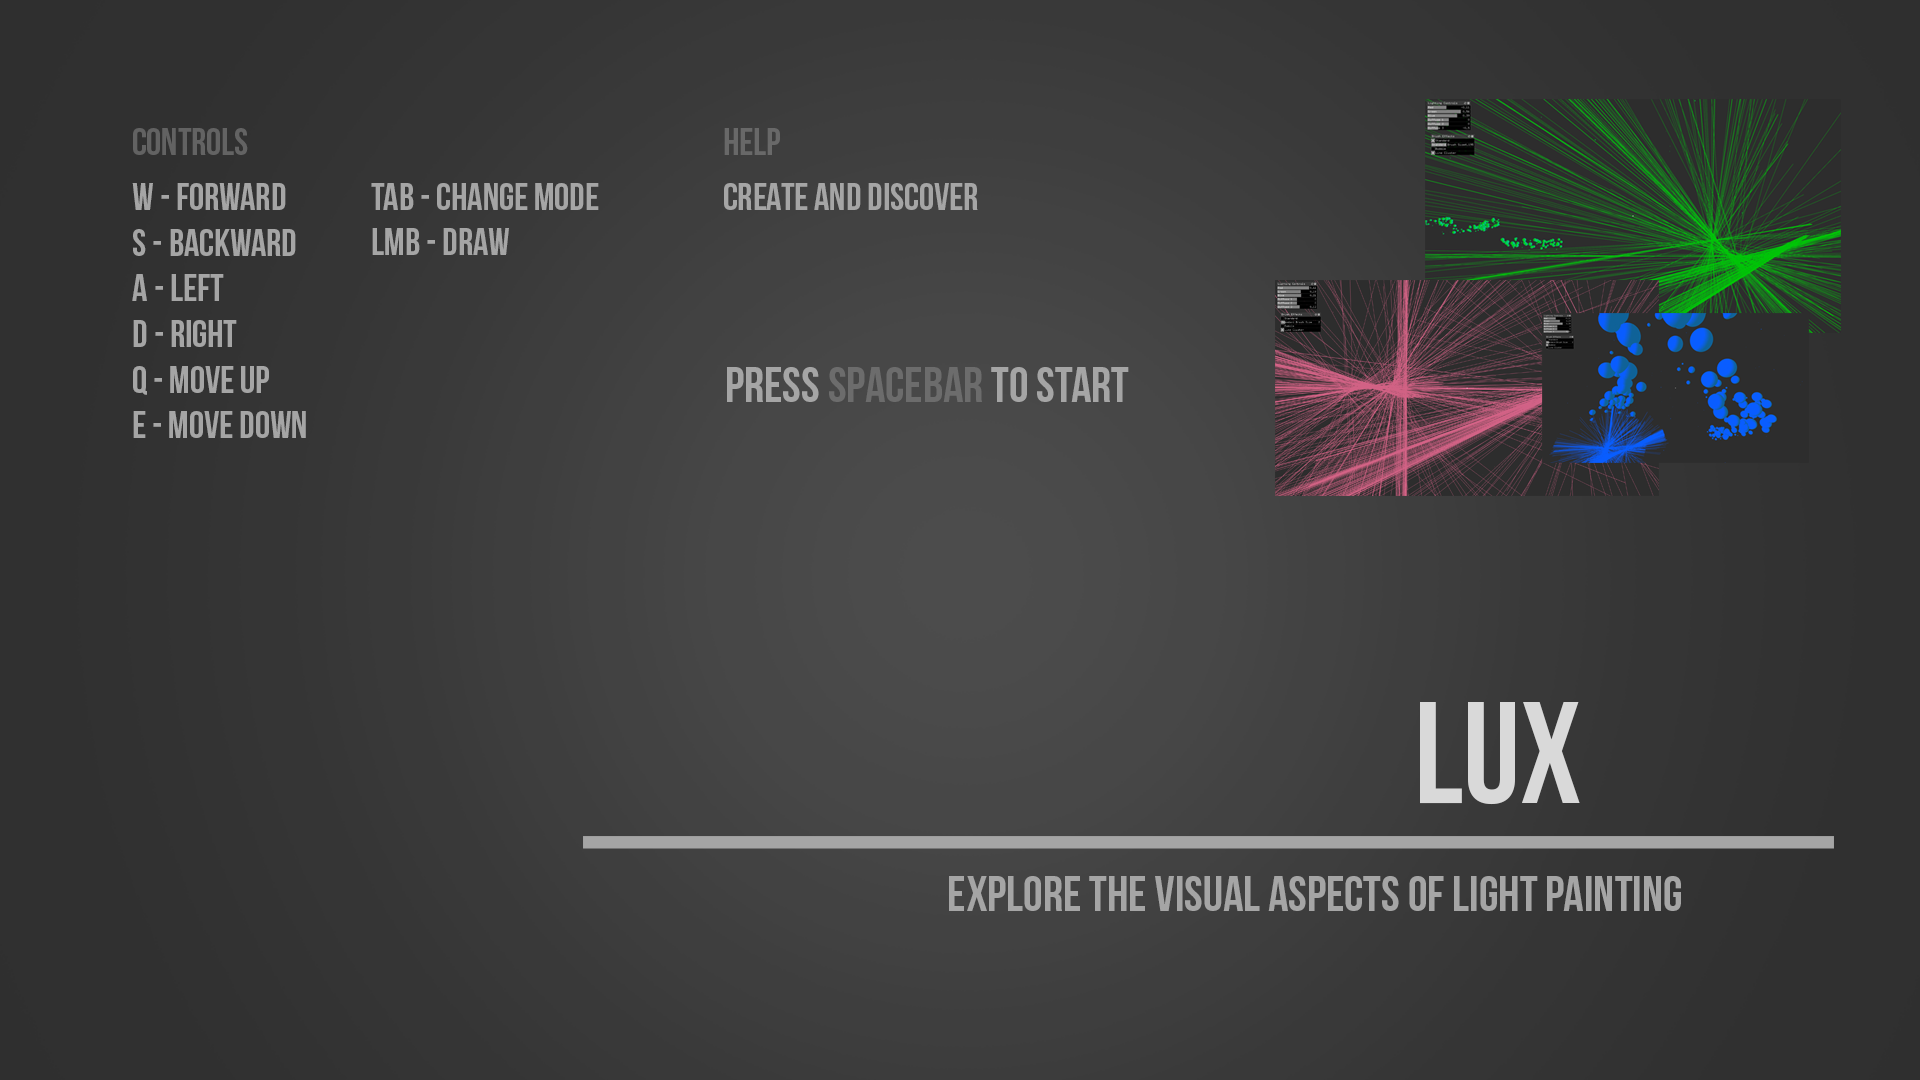 Lux/bin/data/landingPage.png